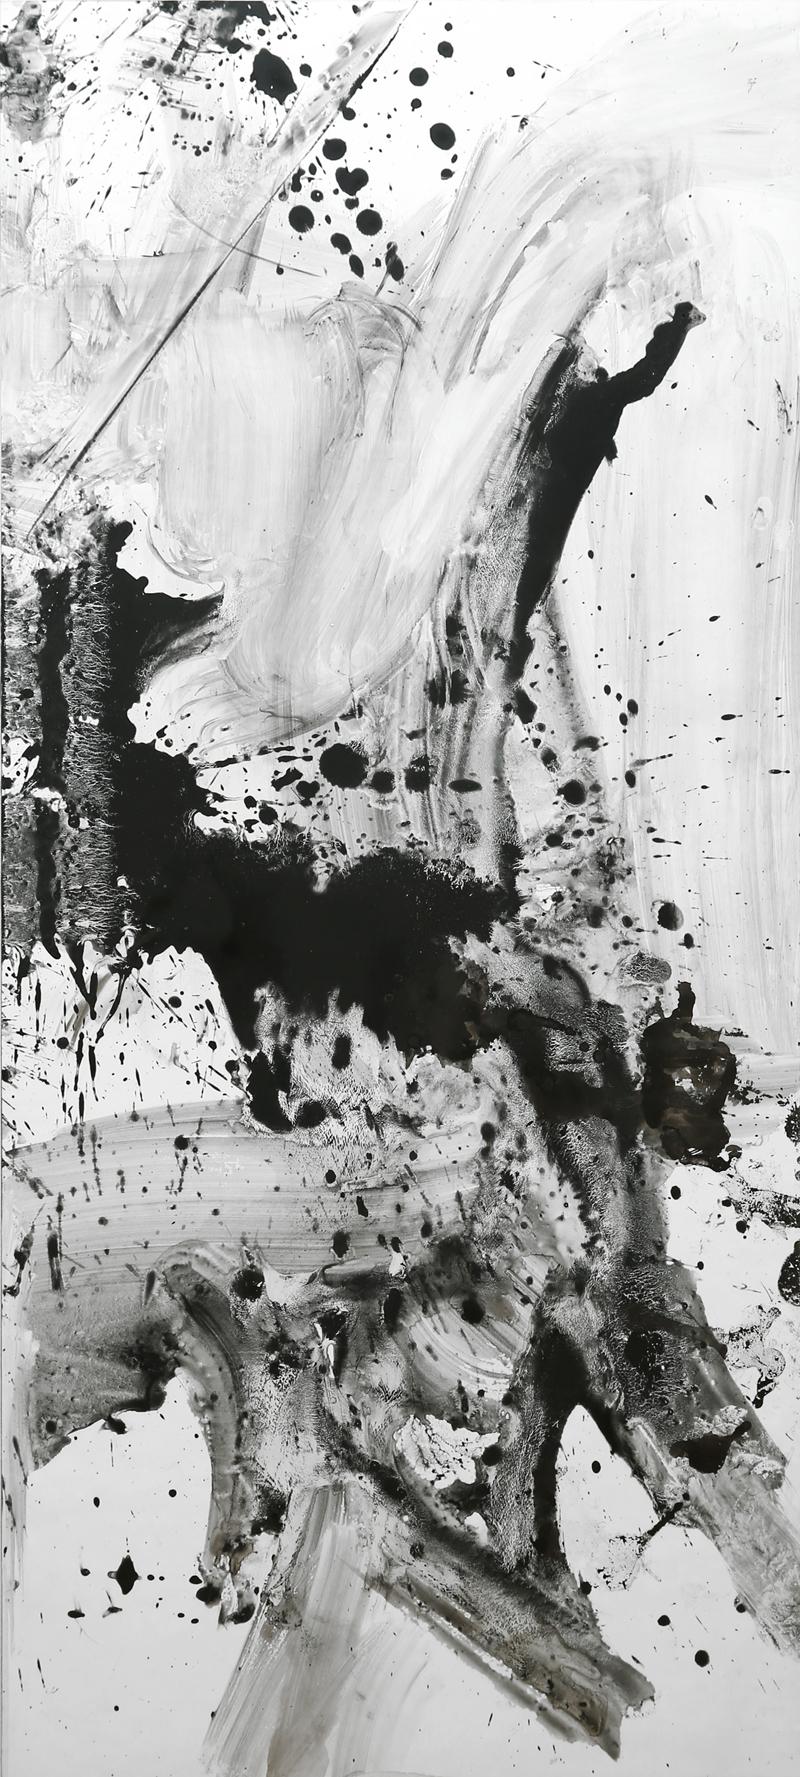 Untitled 02, 2013